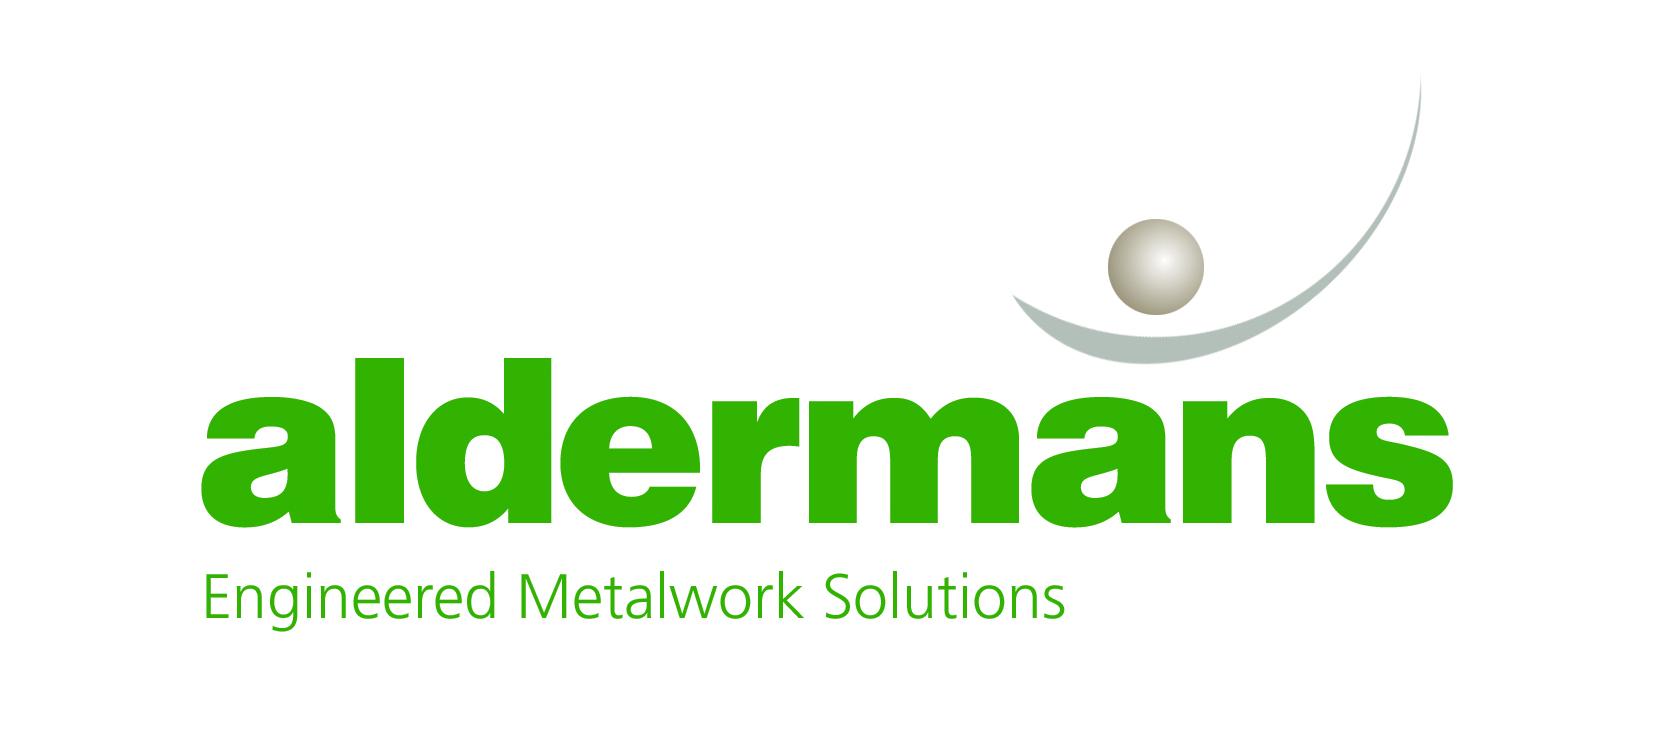 Tony McMinn, Production Manager - Alderman Tooling Ltd